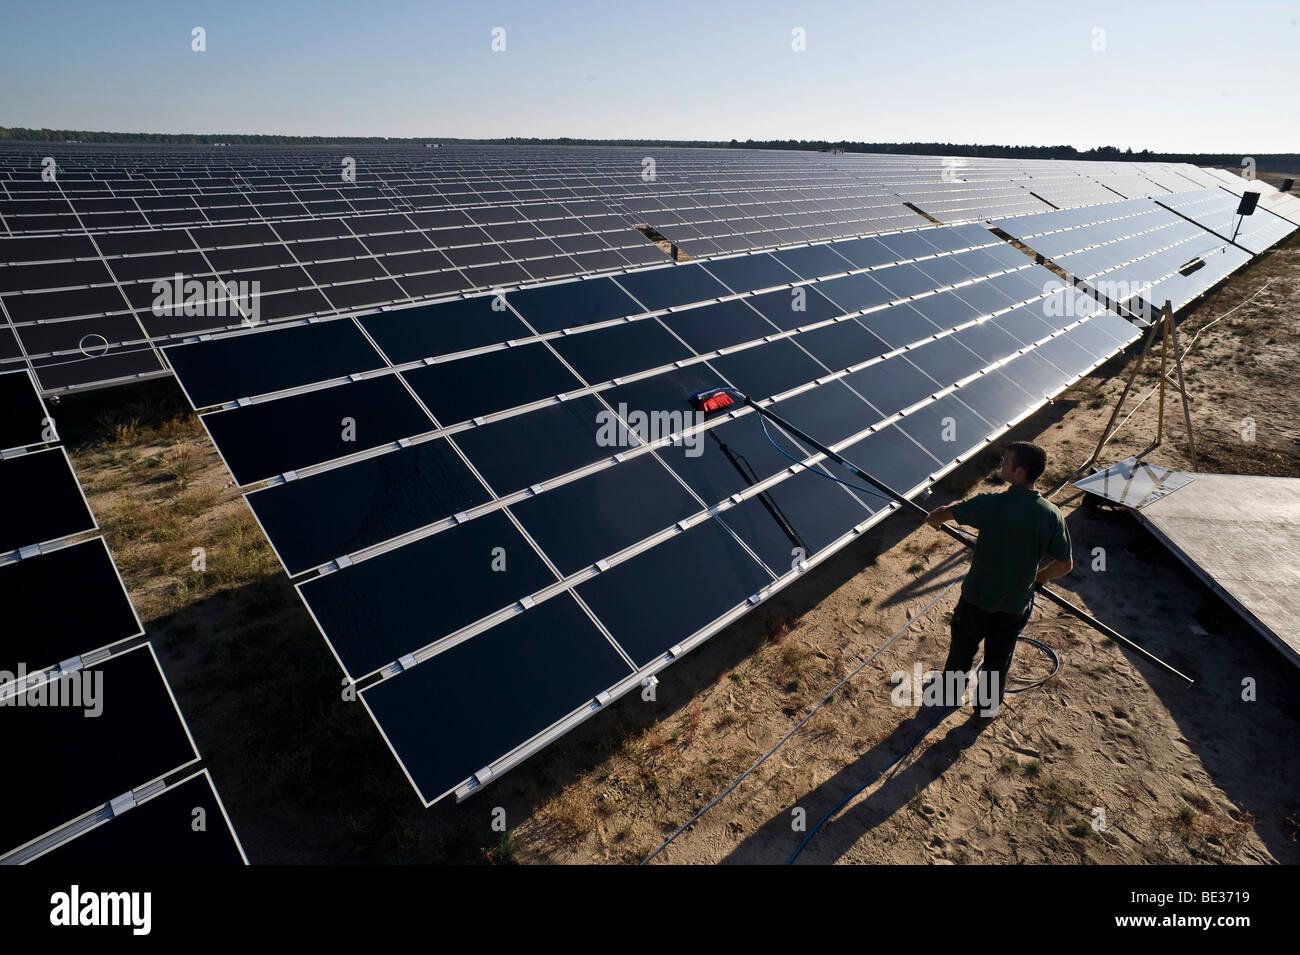 Germany's largest solar farm in Lieberose, Spreewald, Brandenburg, Germany, Europe - Stock Image